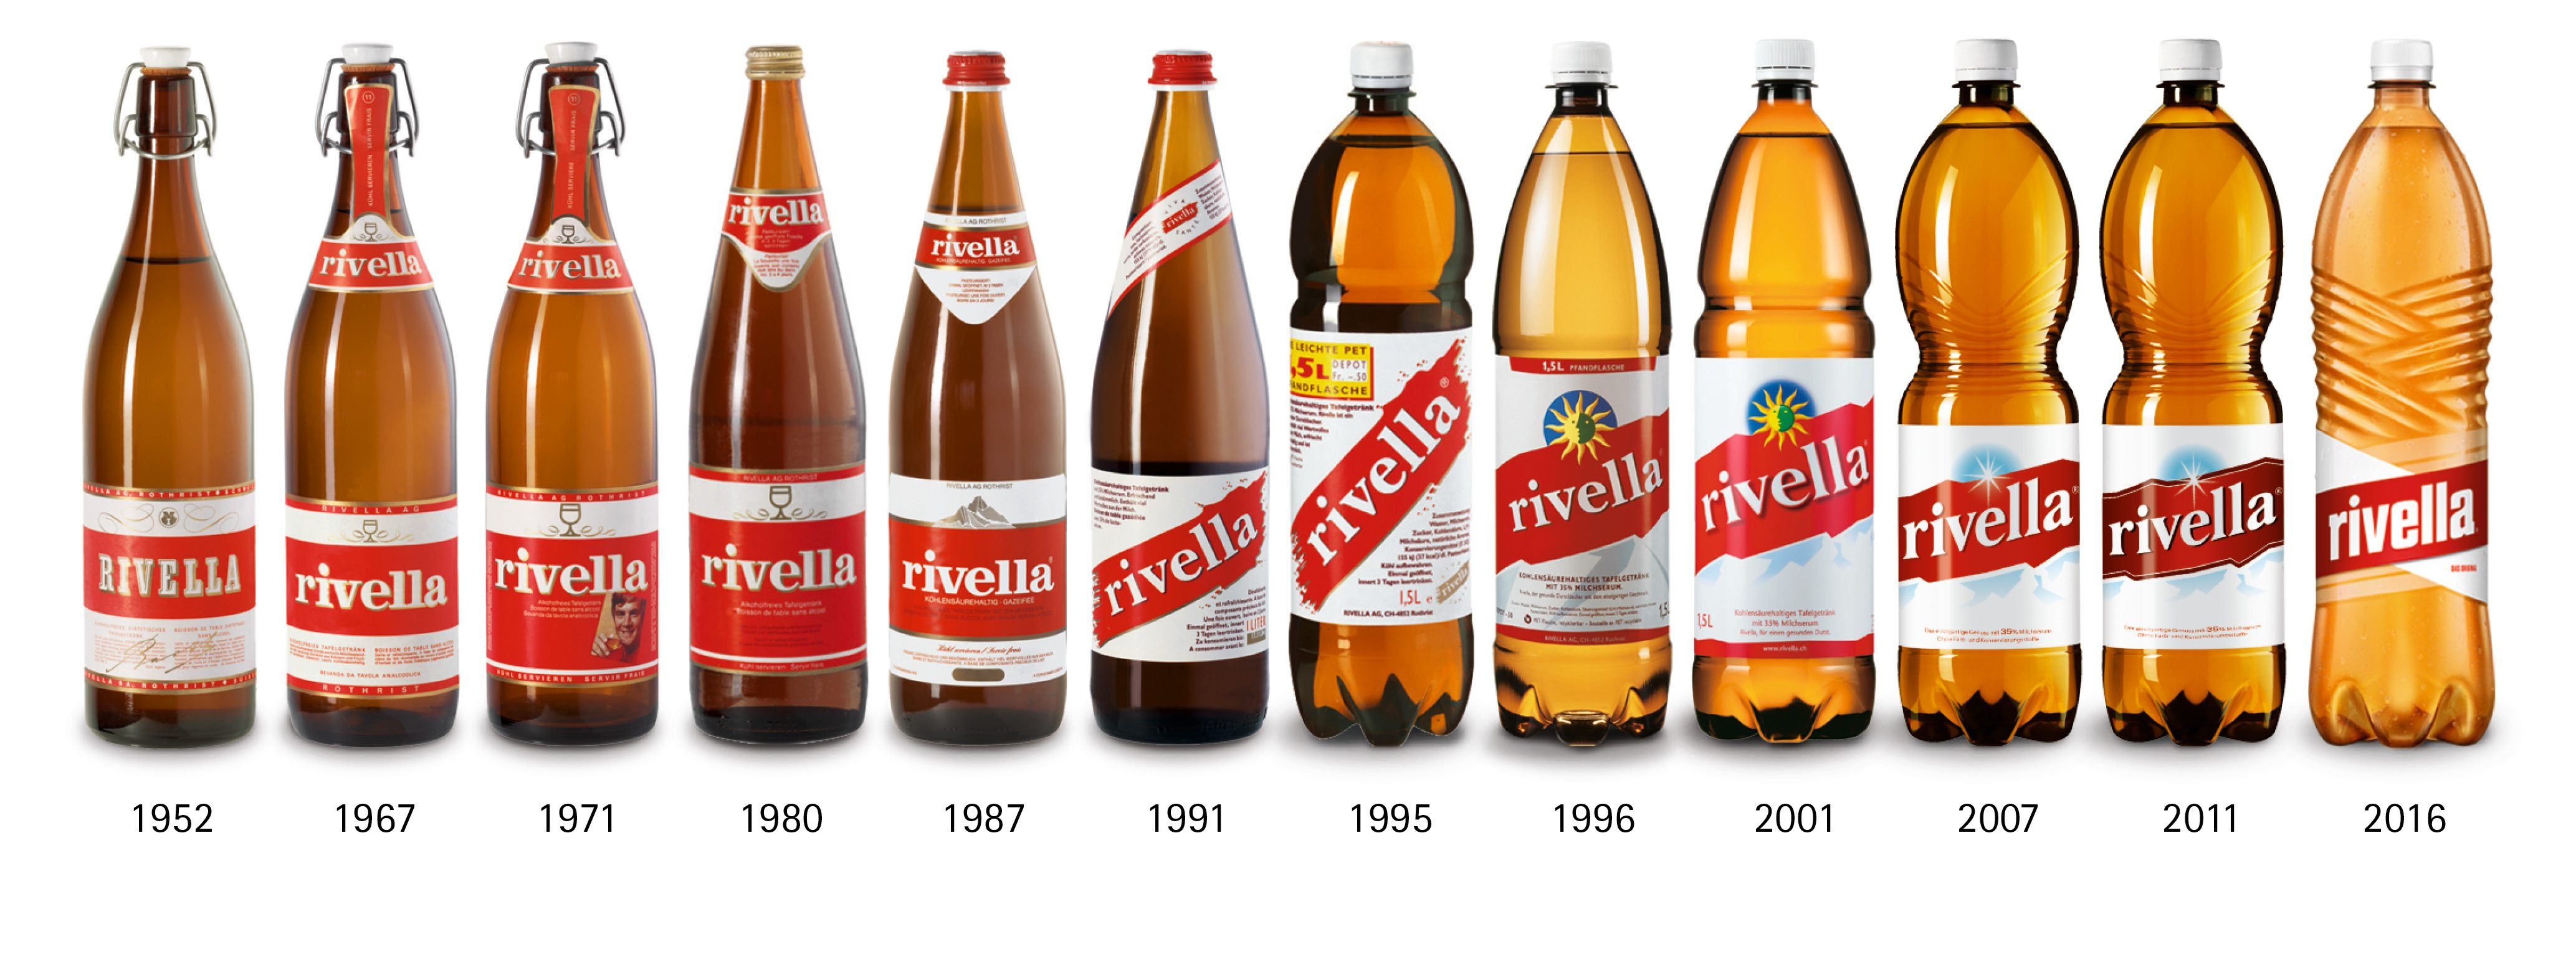 rivella-red-swiss-soft-drink-swissmade-direct